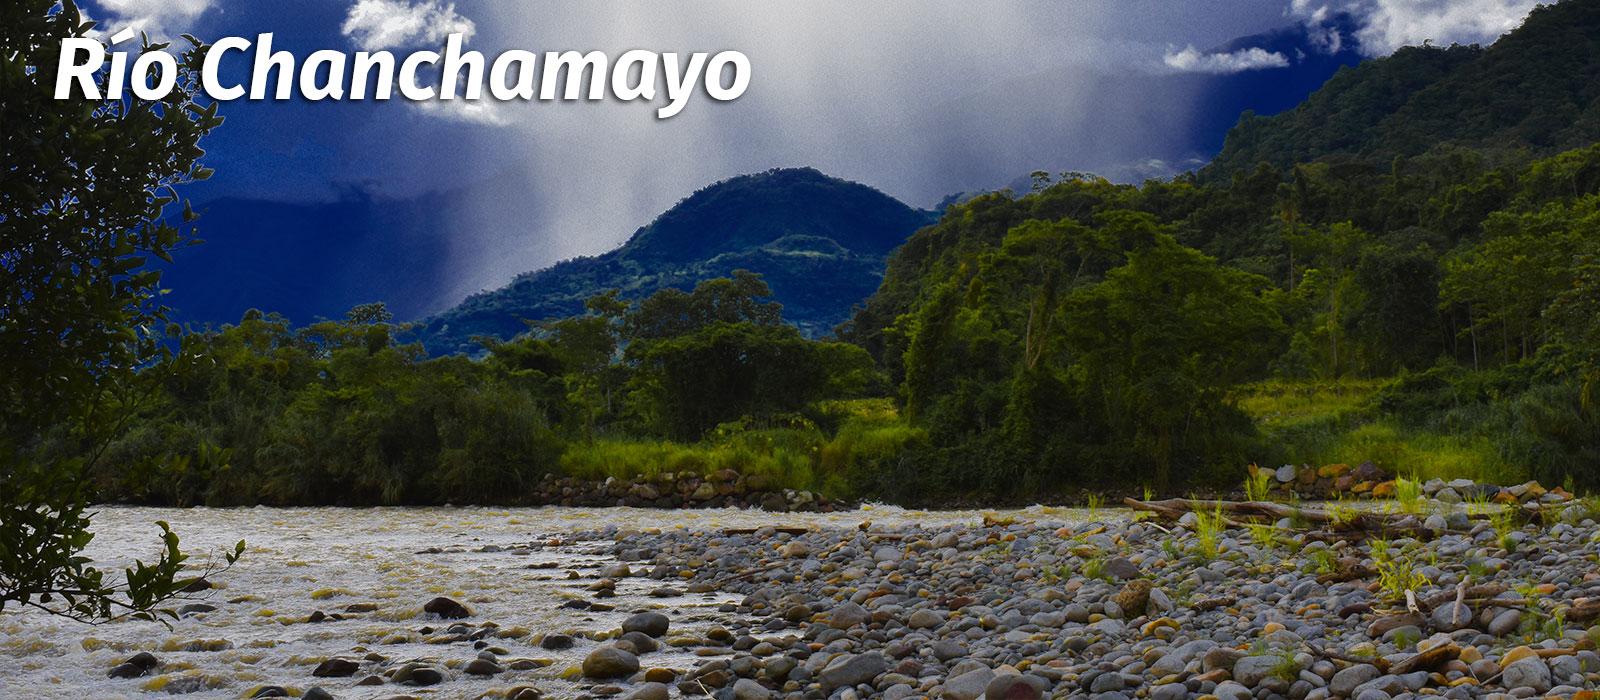 Río Chanchamayo